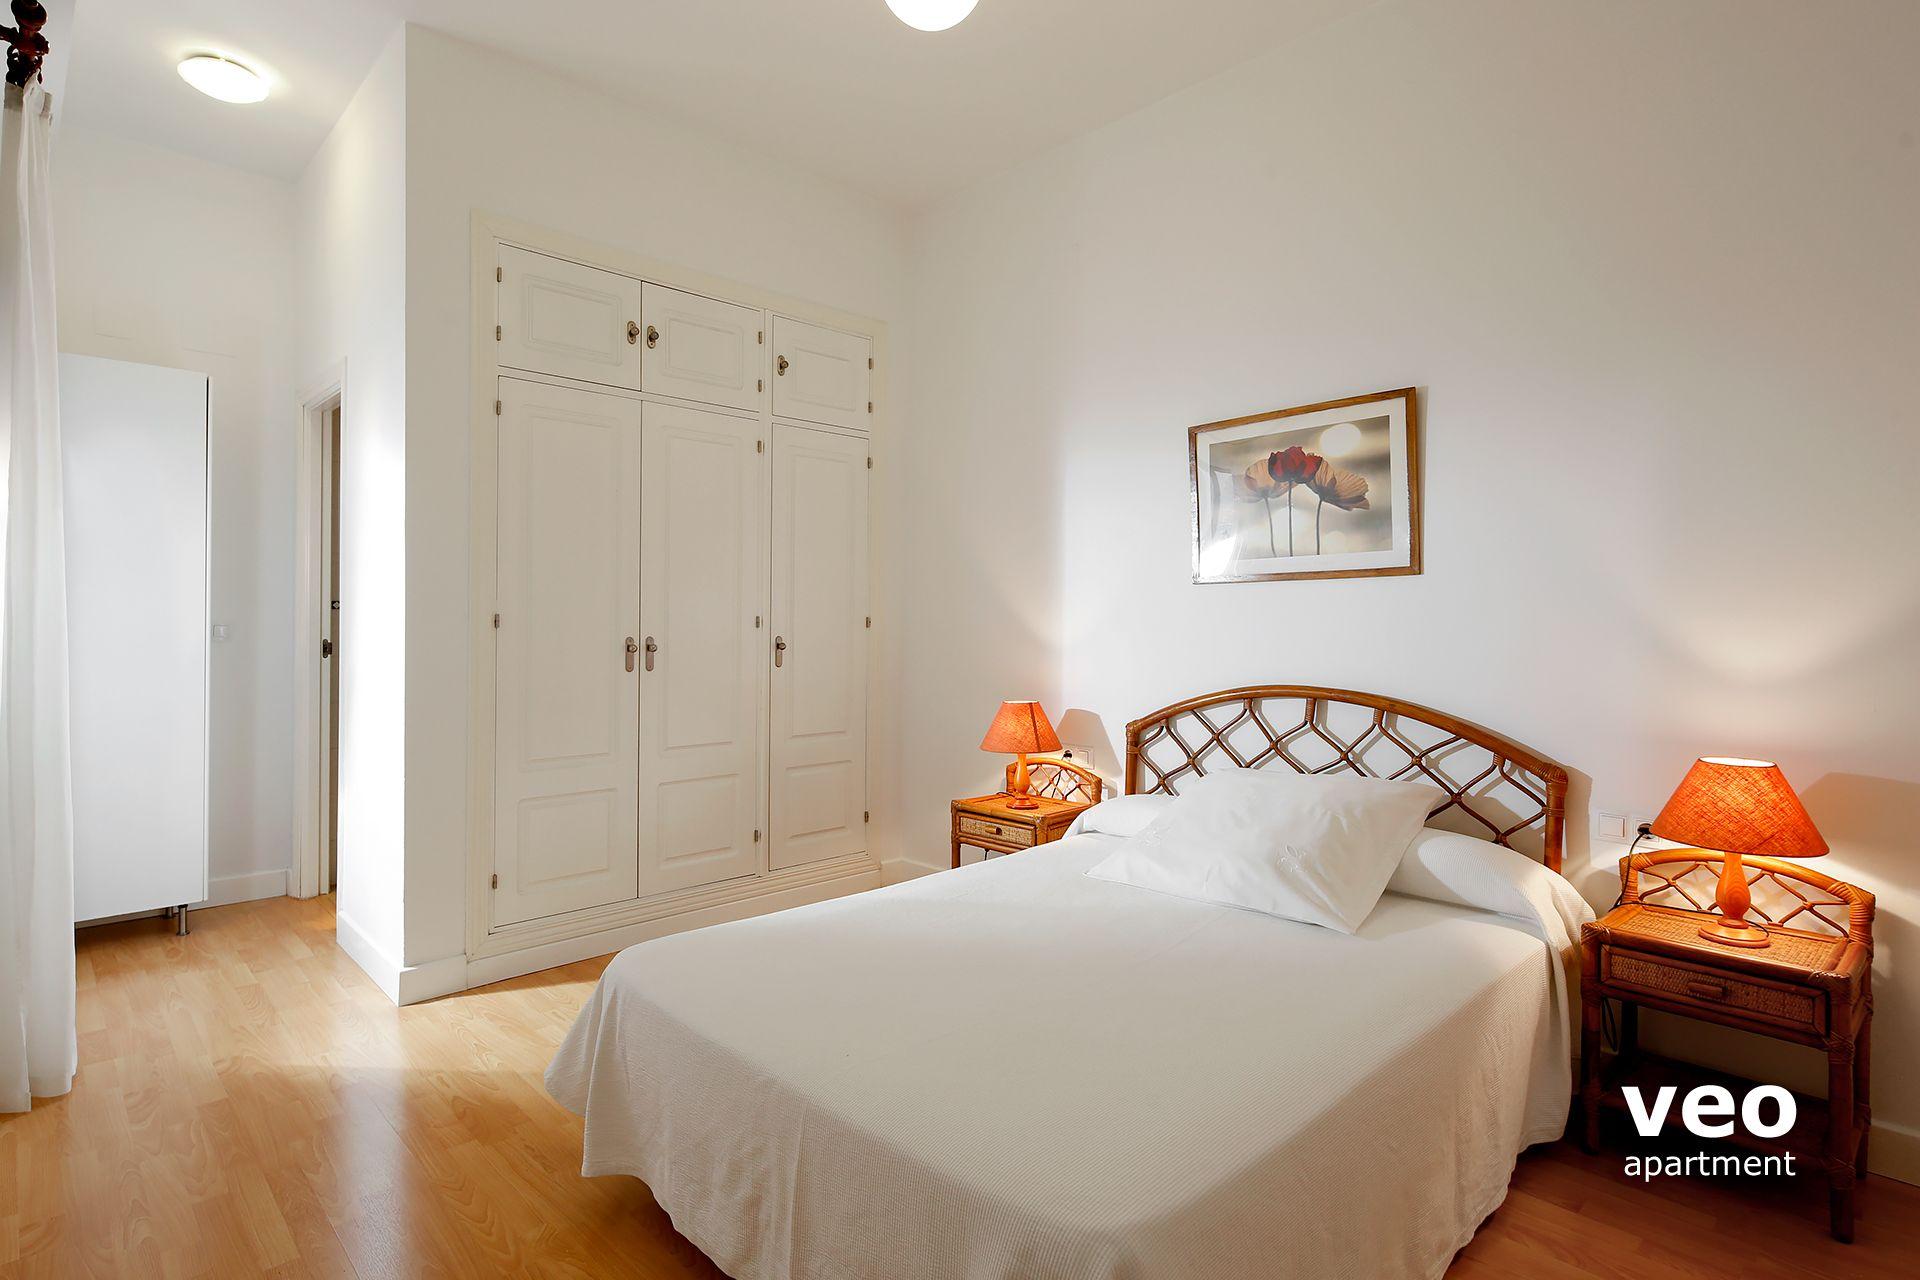 Seville Apartment Alejo Fernandez Street Seville Spain | Alejo ...